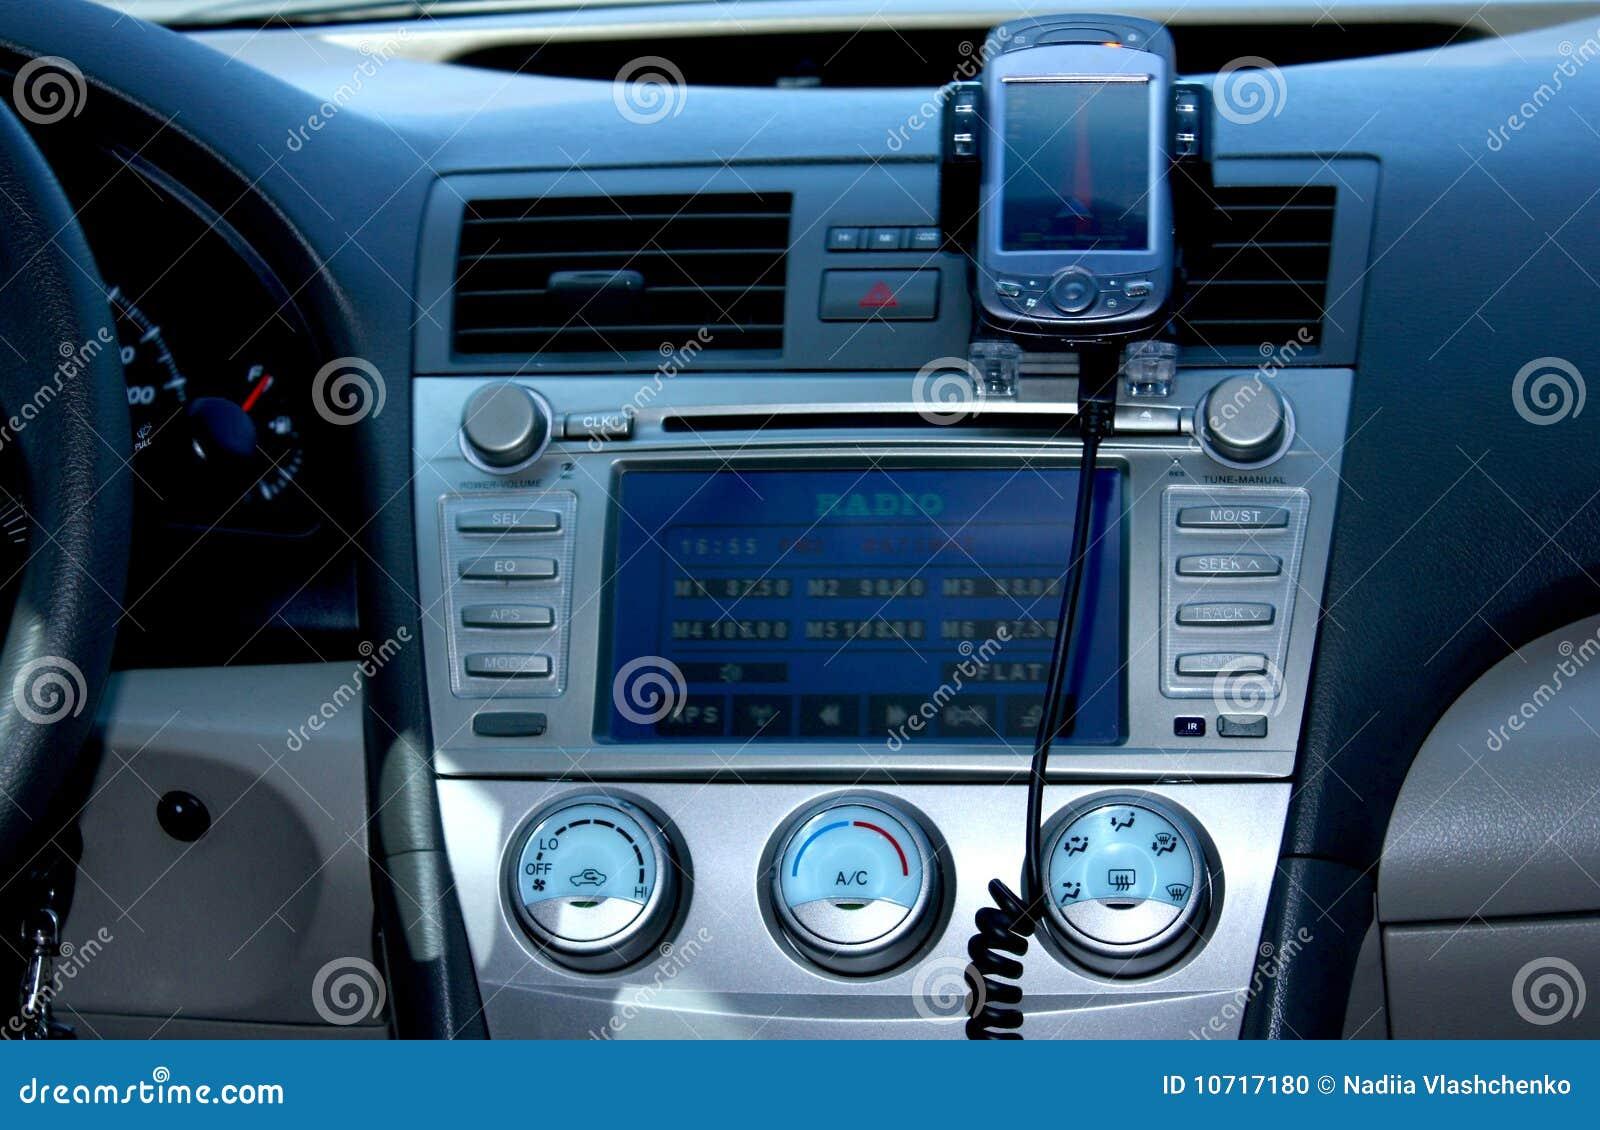 car interior stock photo image 10717180. Black Bedroom Furniture Sets. Home Design Ideas